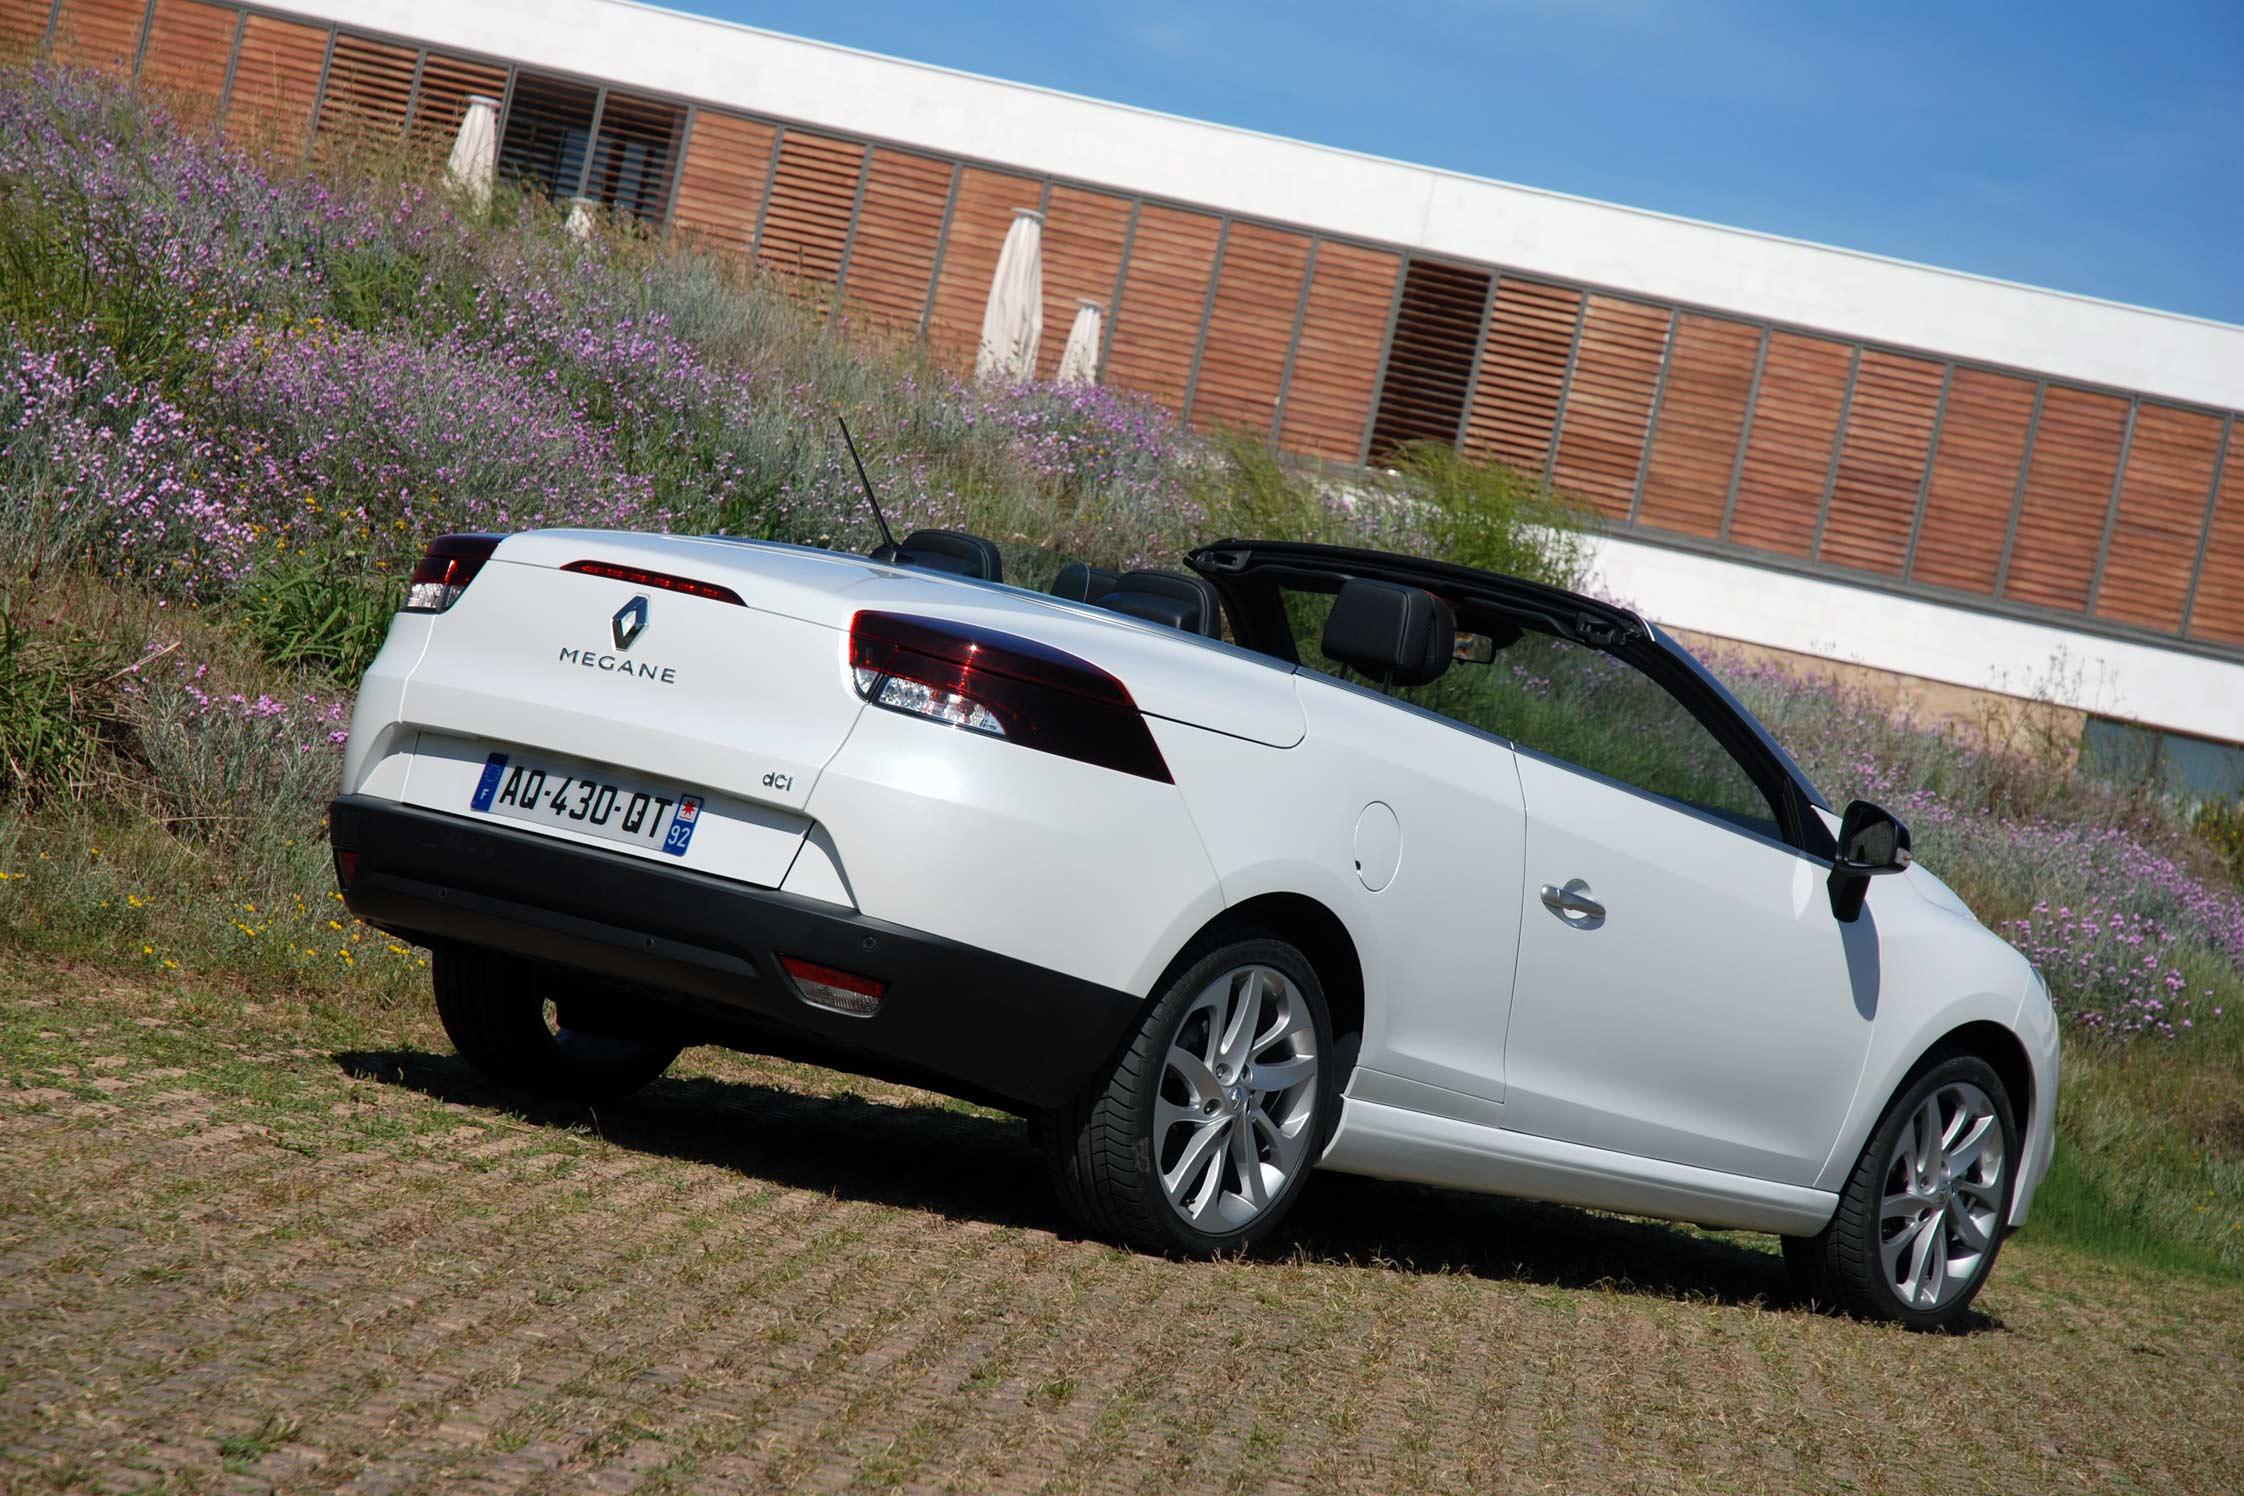 photo renault megane cc iii dci 160 fap coup cabriolet 2010 m diatheque. Black Bedroom Furniture Sets. Home Design Ideas